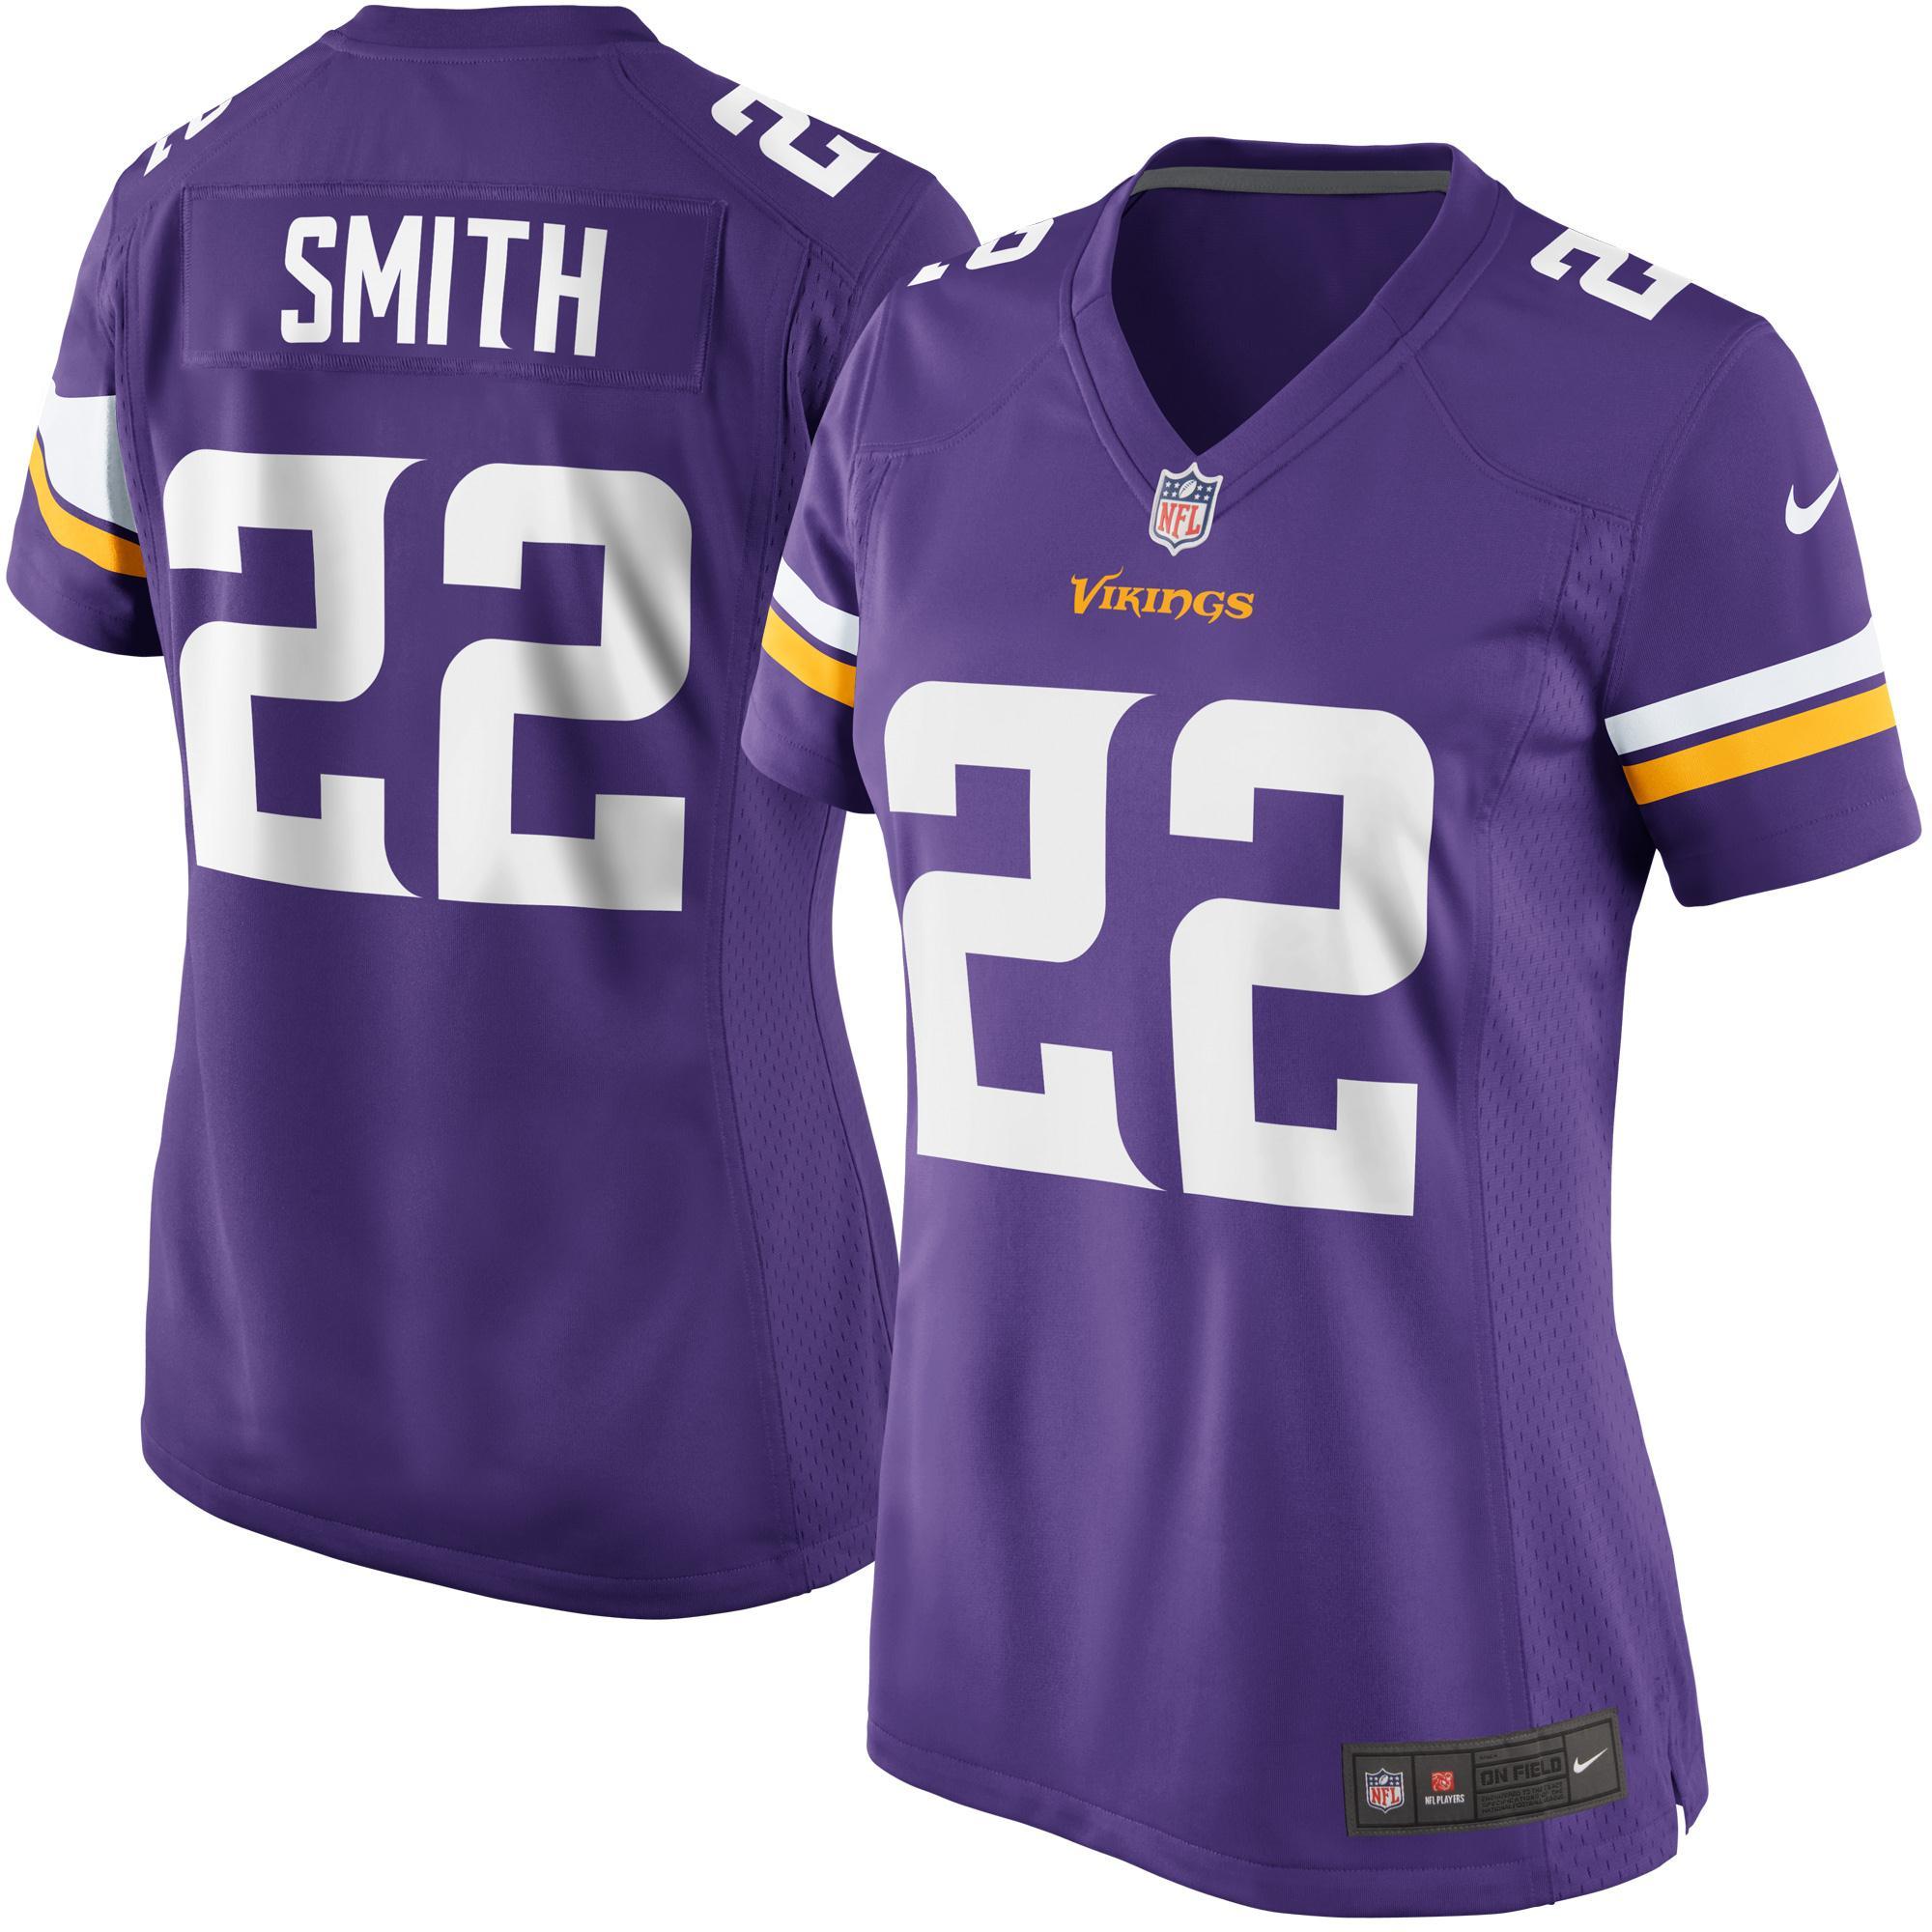 Harrison Smith Minnesota Vikings Nike Women's Game Player Jersey - Purple